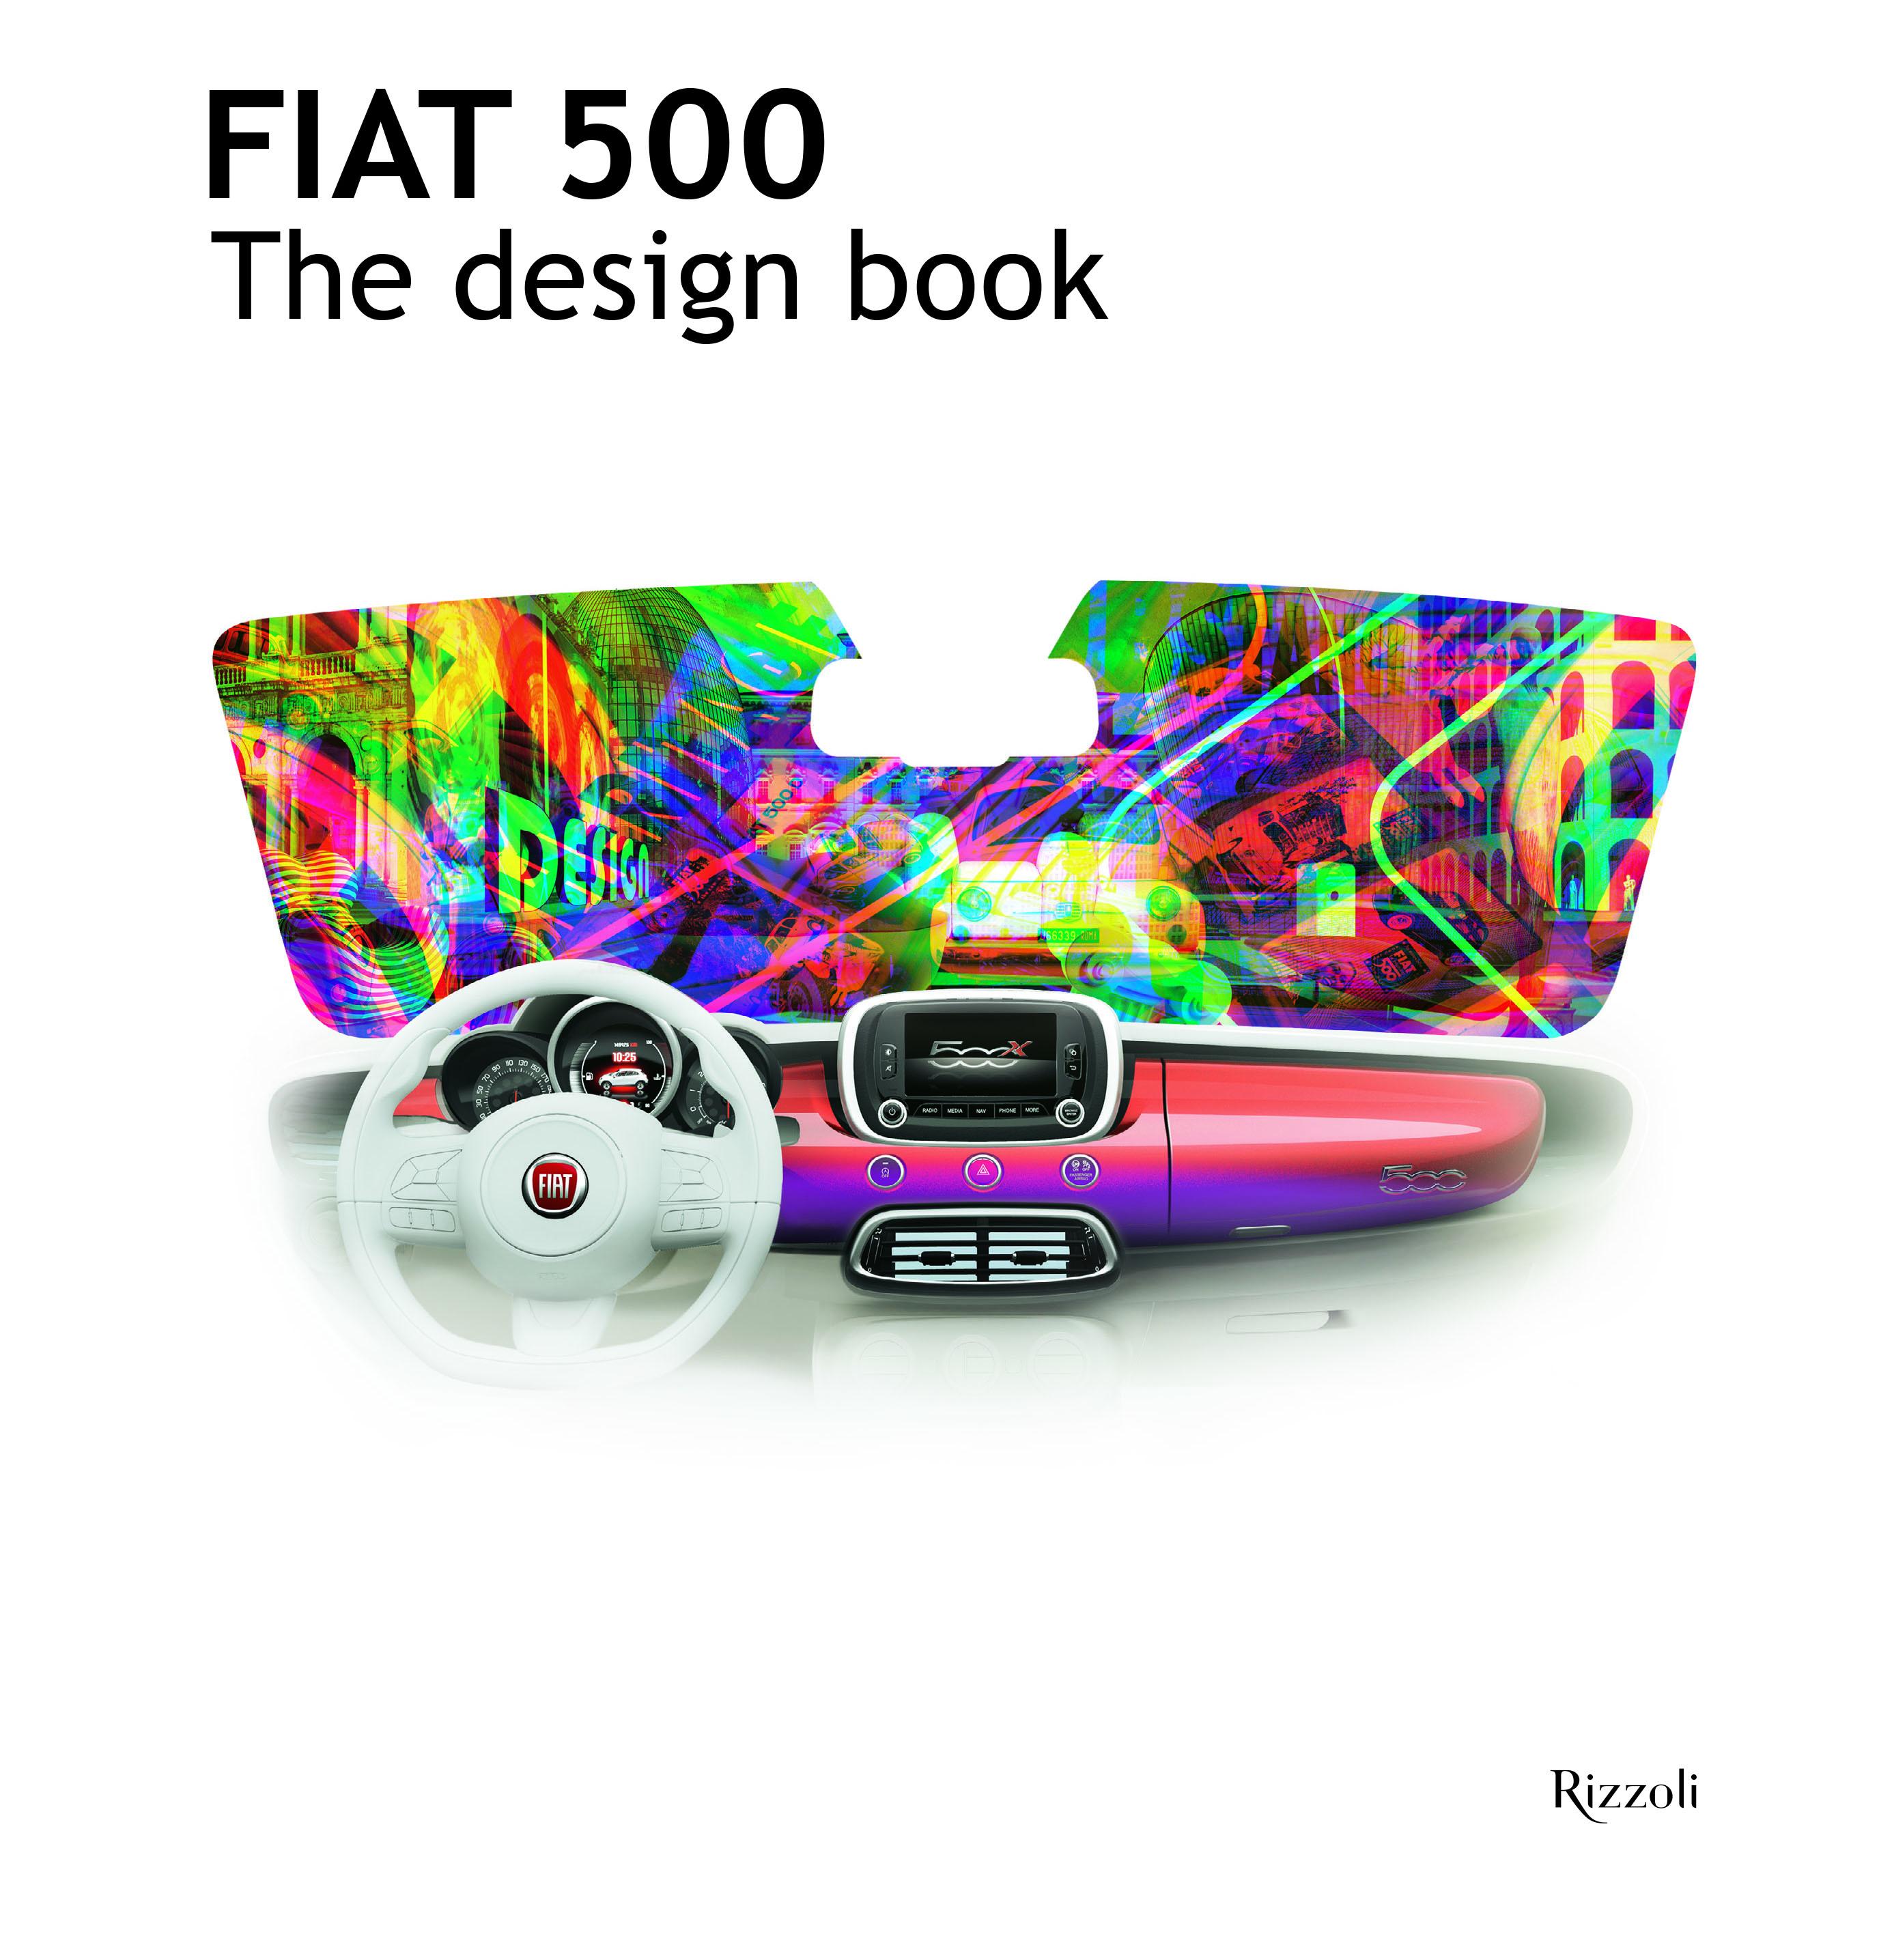 COVER Fiat 500 - Design book